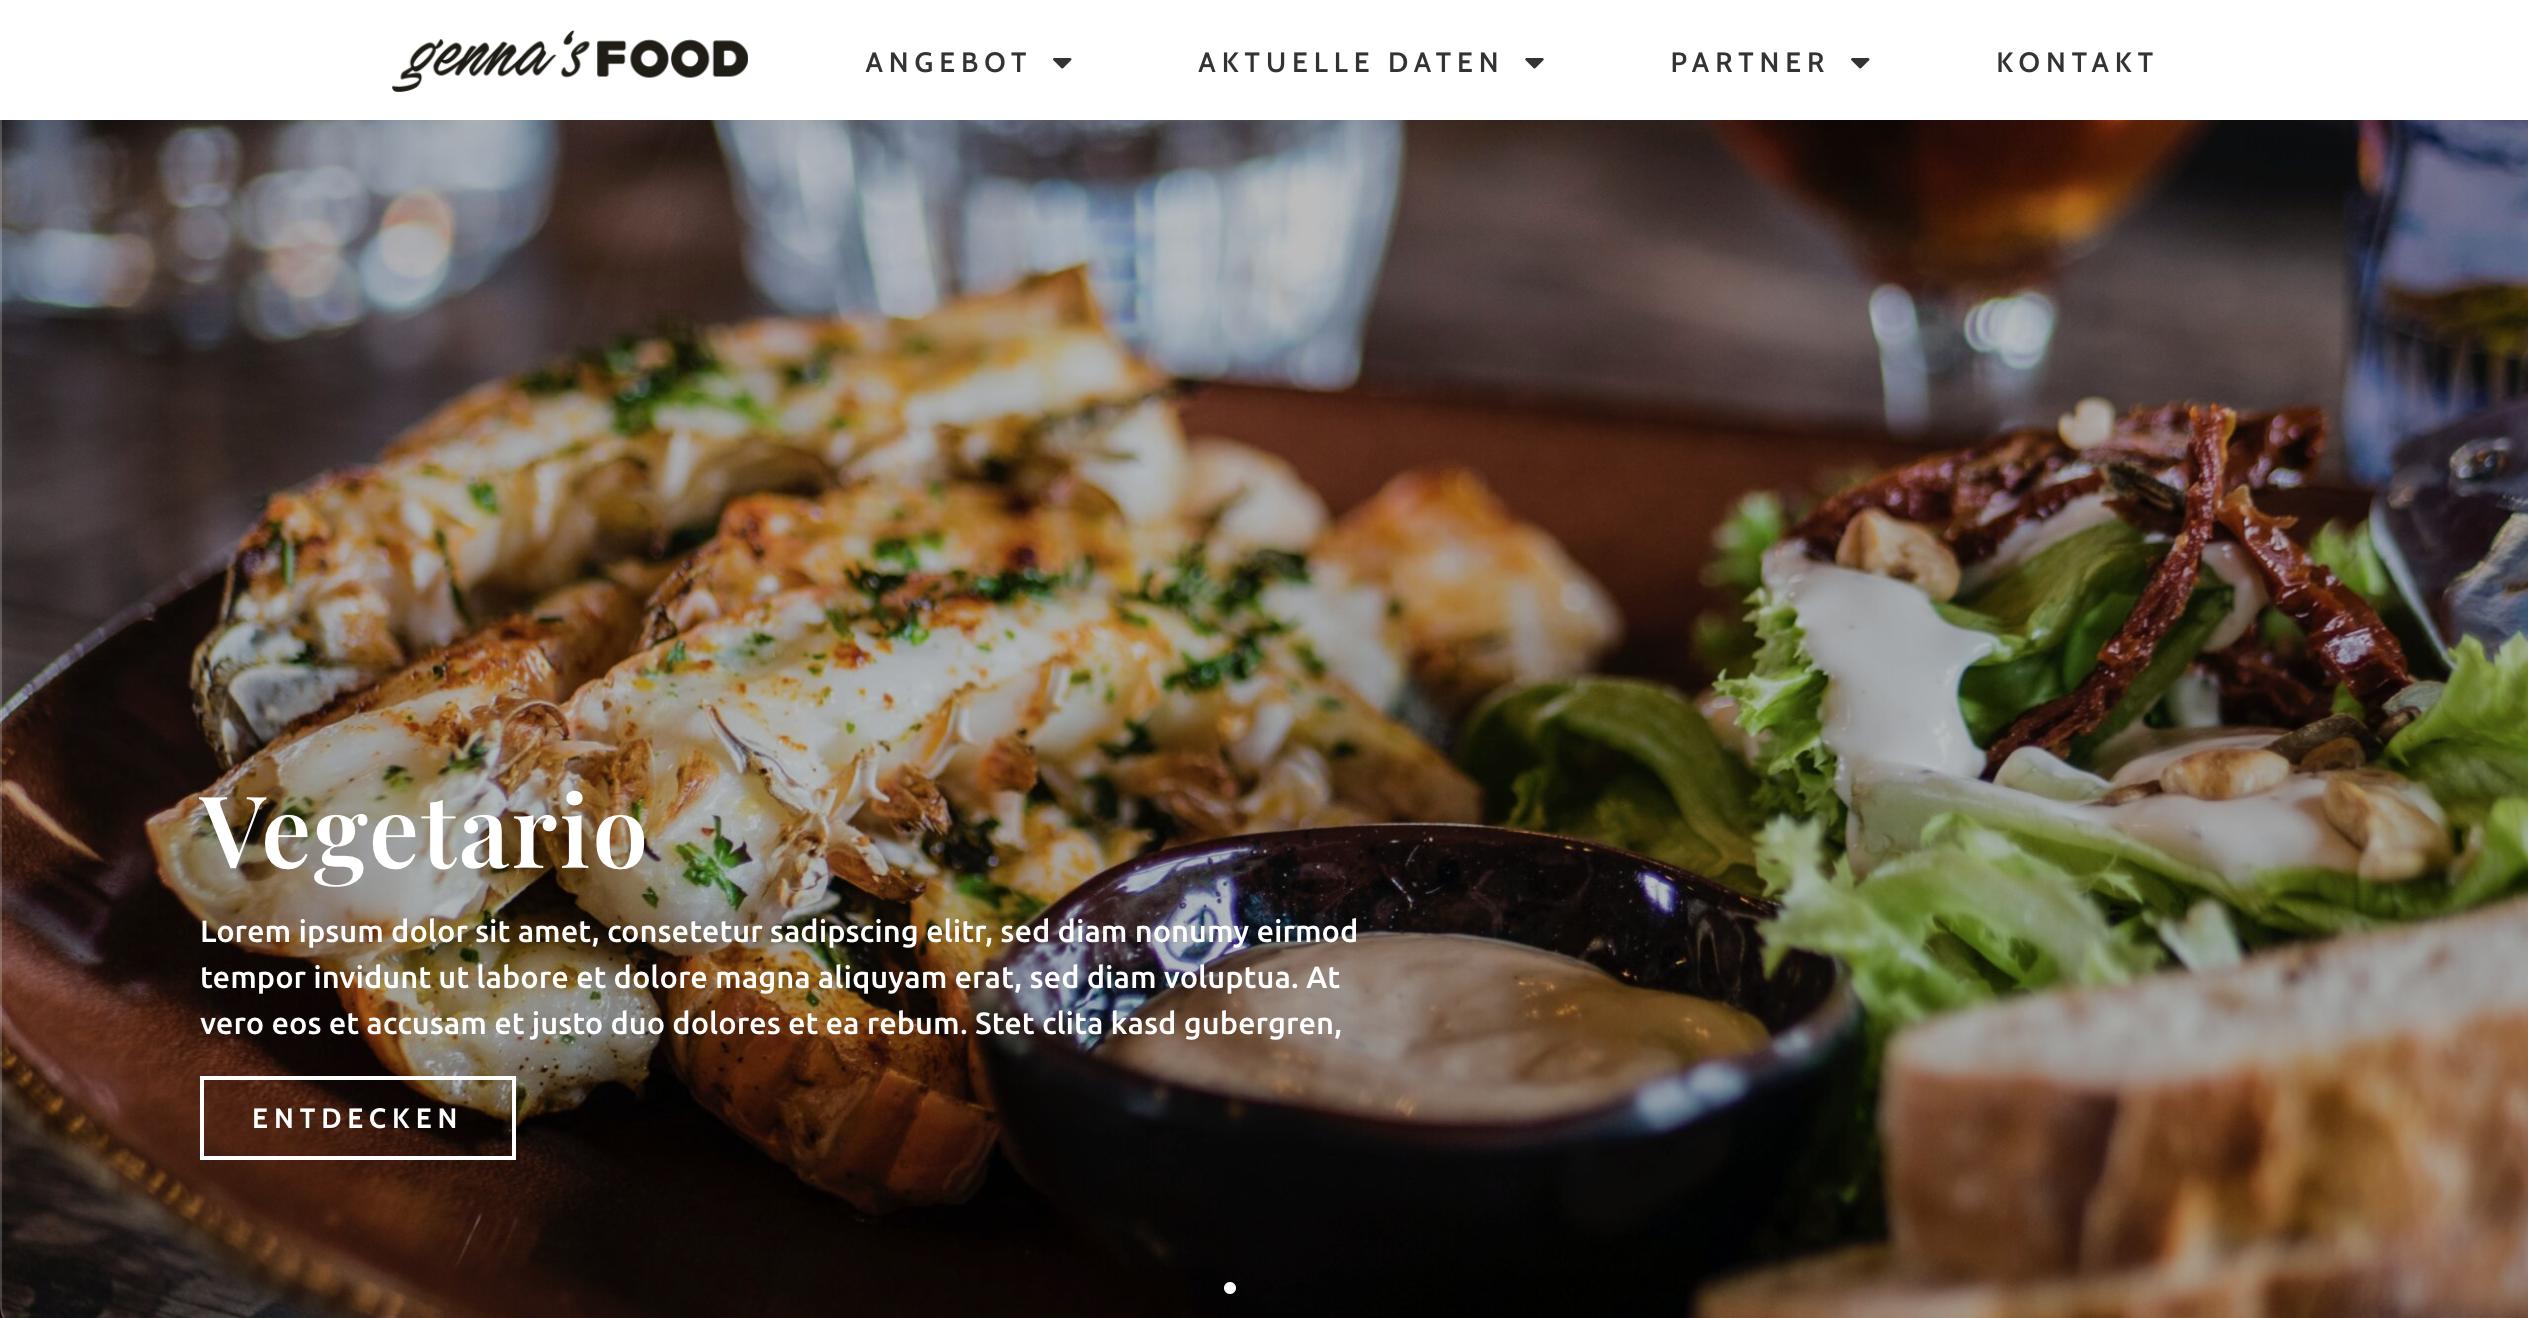 gennas-food screenshot website